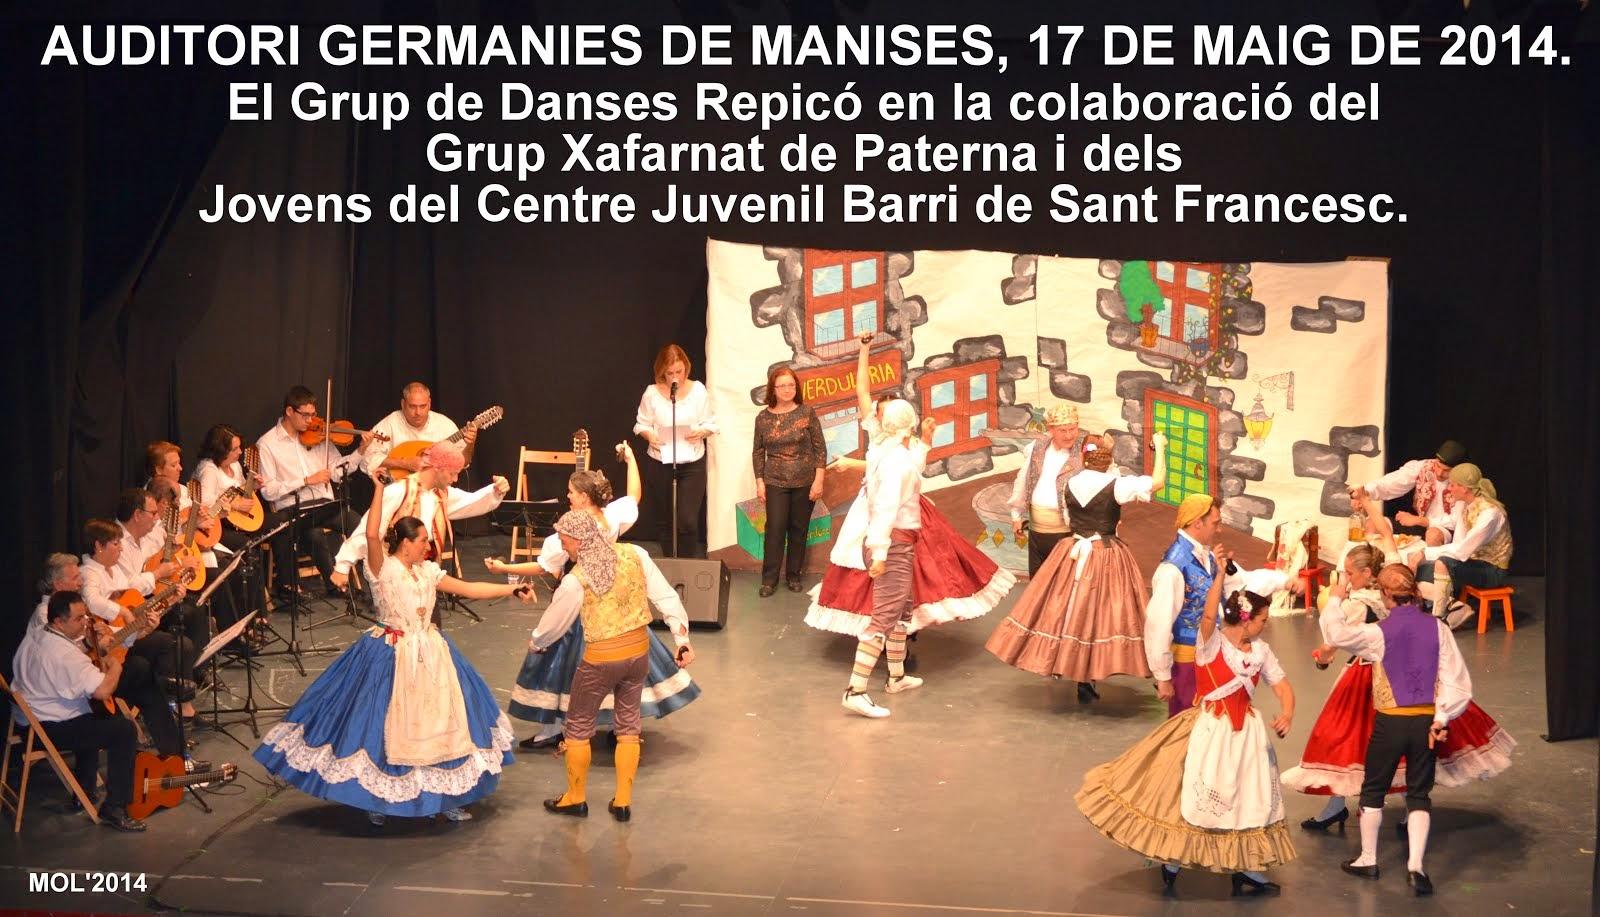 EL GRUP DE DANSES REPICÓ, MUSICA I VALLS VALENCIANS. SÁBADO 17 DE MAYO